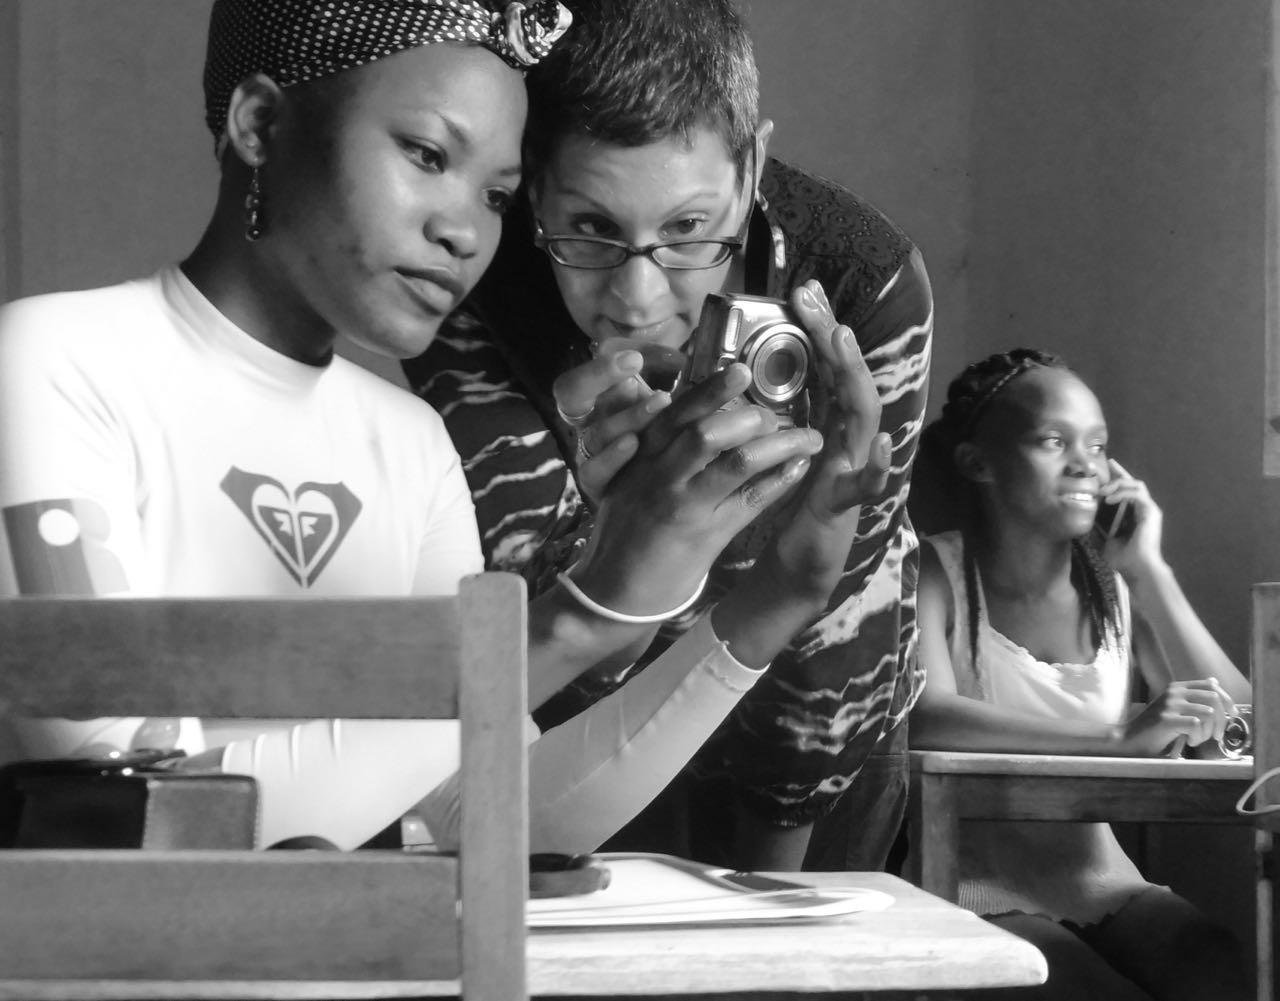 Amina instructing student on camera settings, Cameras for Girls Uganda